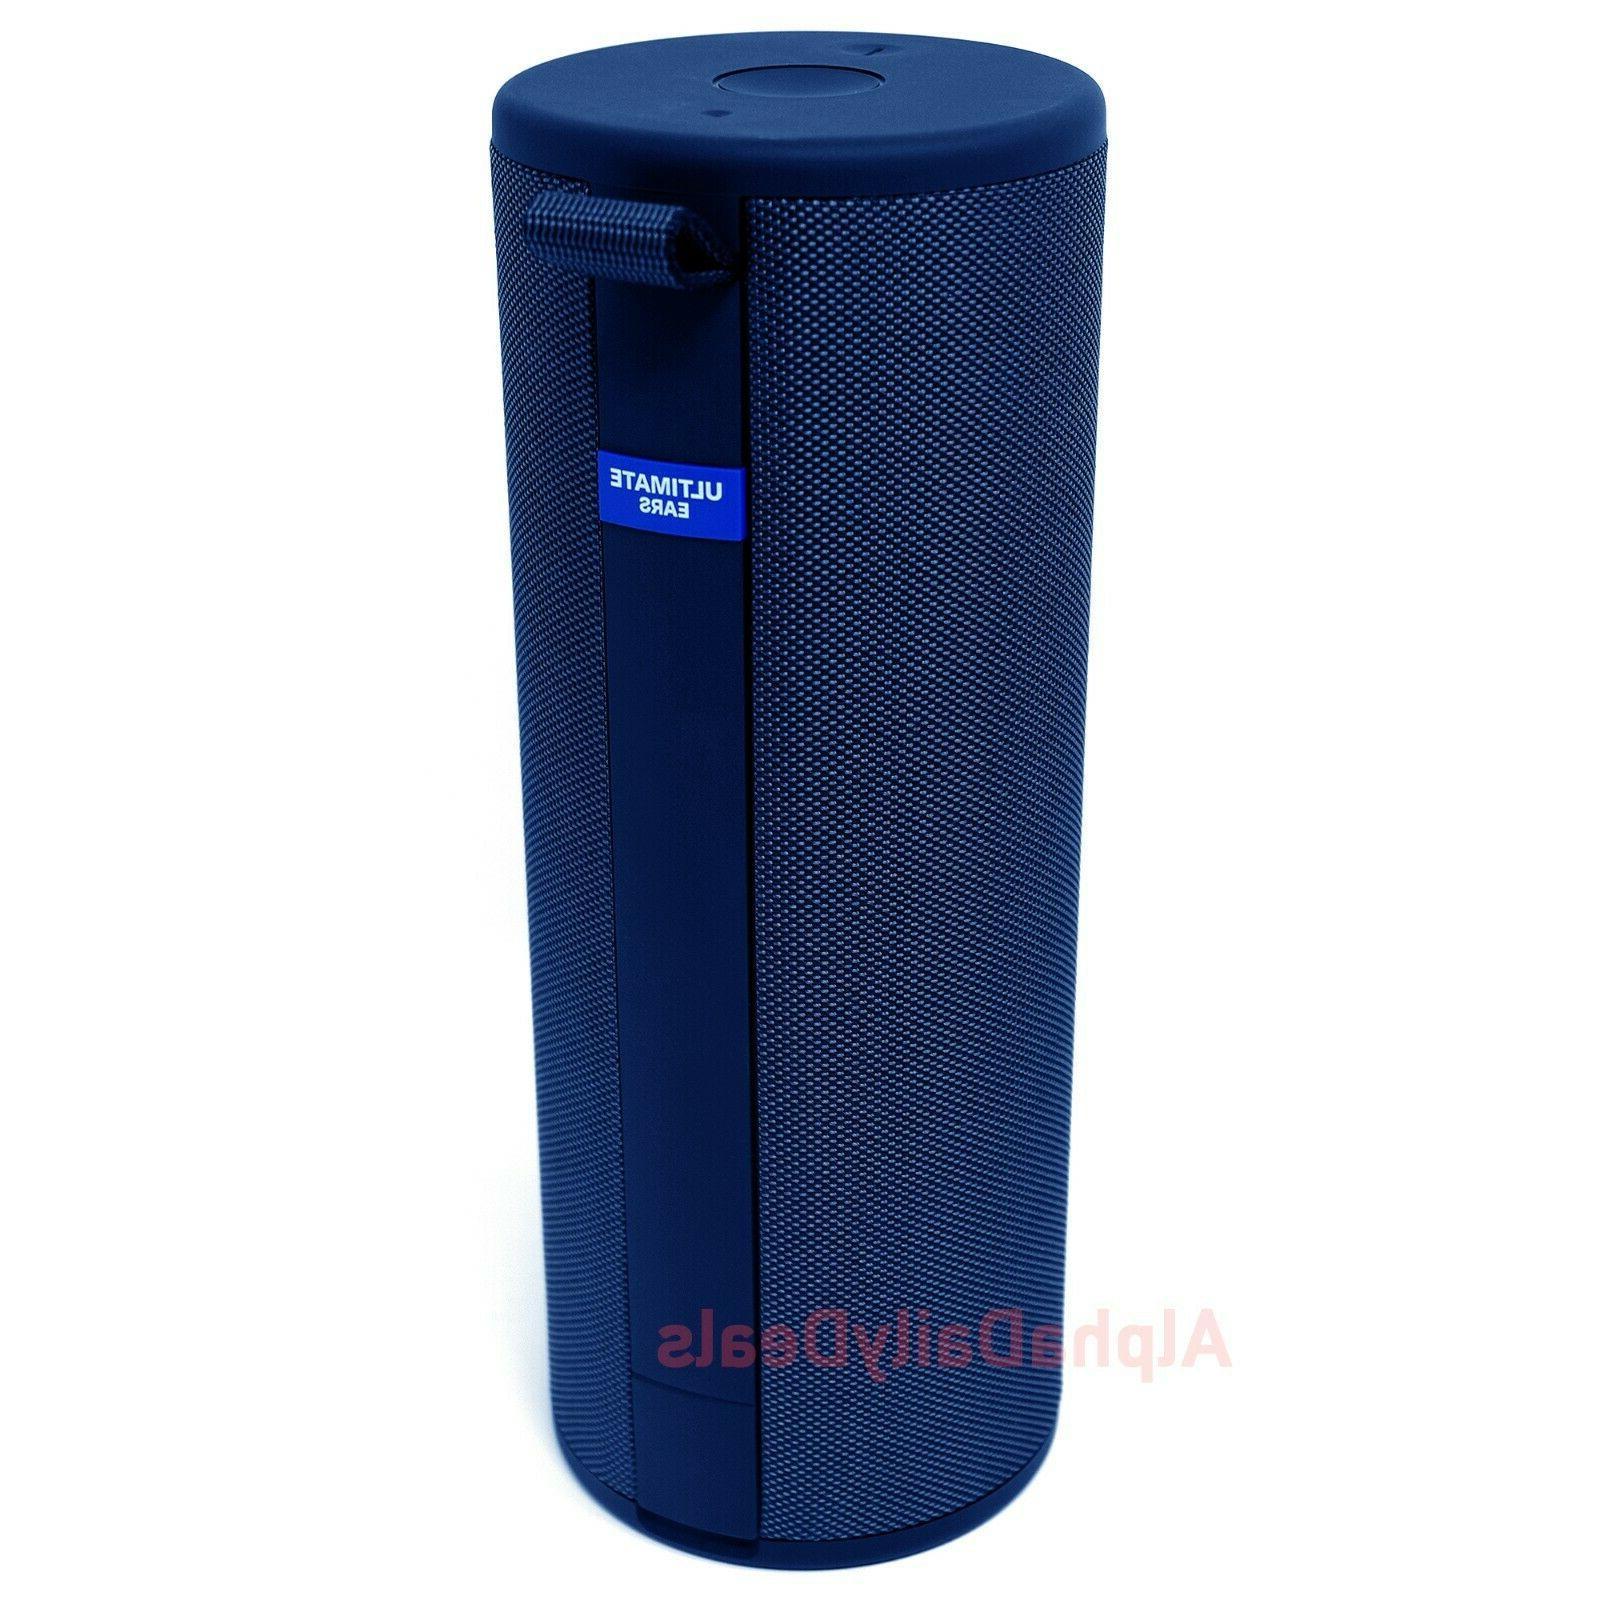 Ultimate 3 Portable Wireless Bluetooth